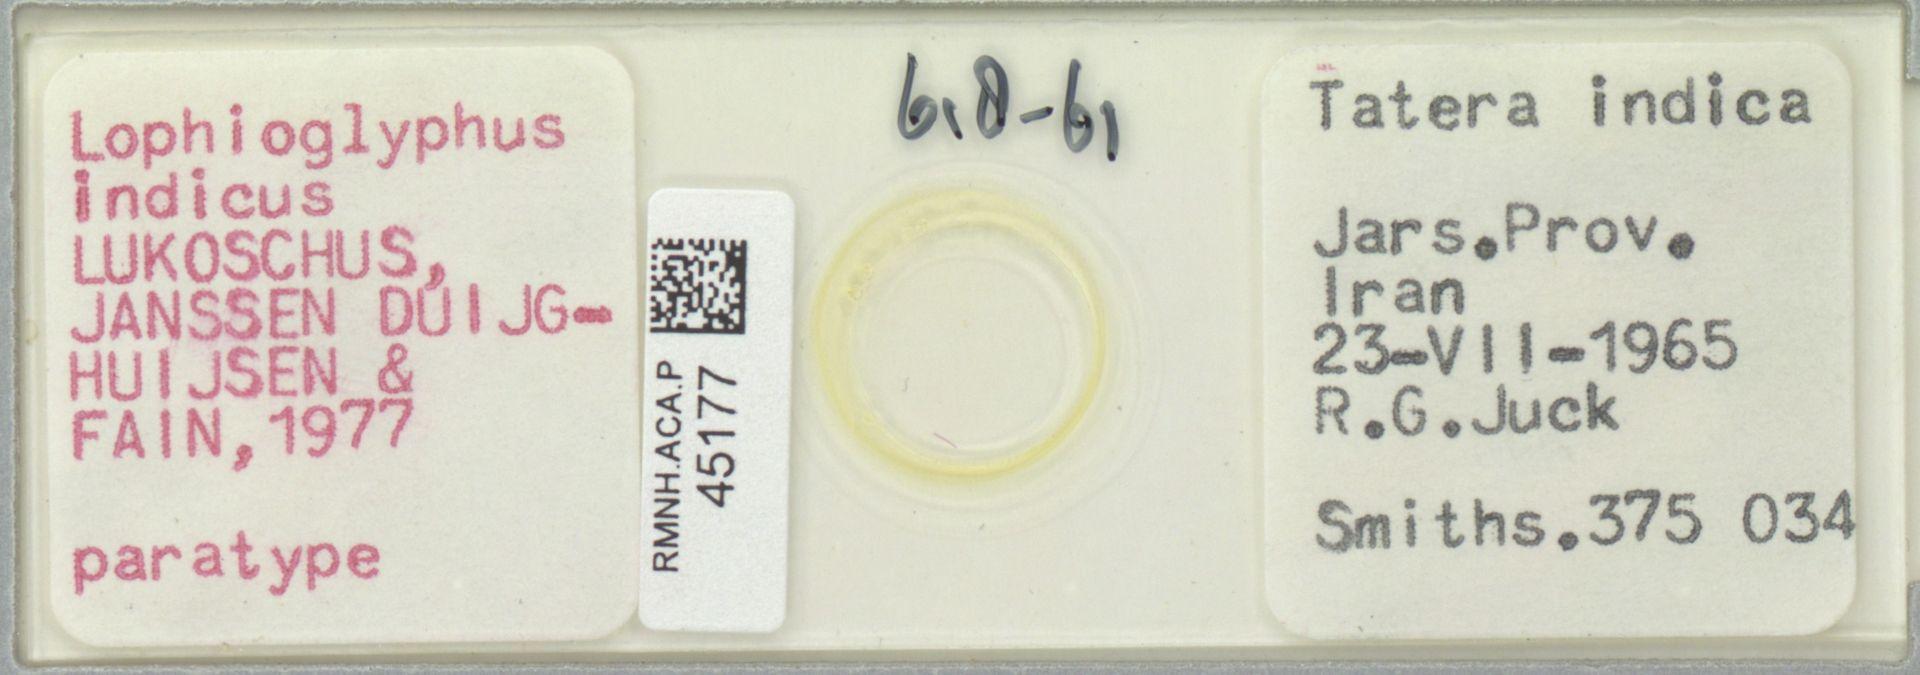 RMNH.ACA.P.45177 | Lophioglyphus indicus Lukoschus, Janssen Duijghuijsen & Fain, 1977